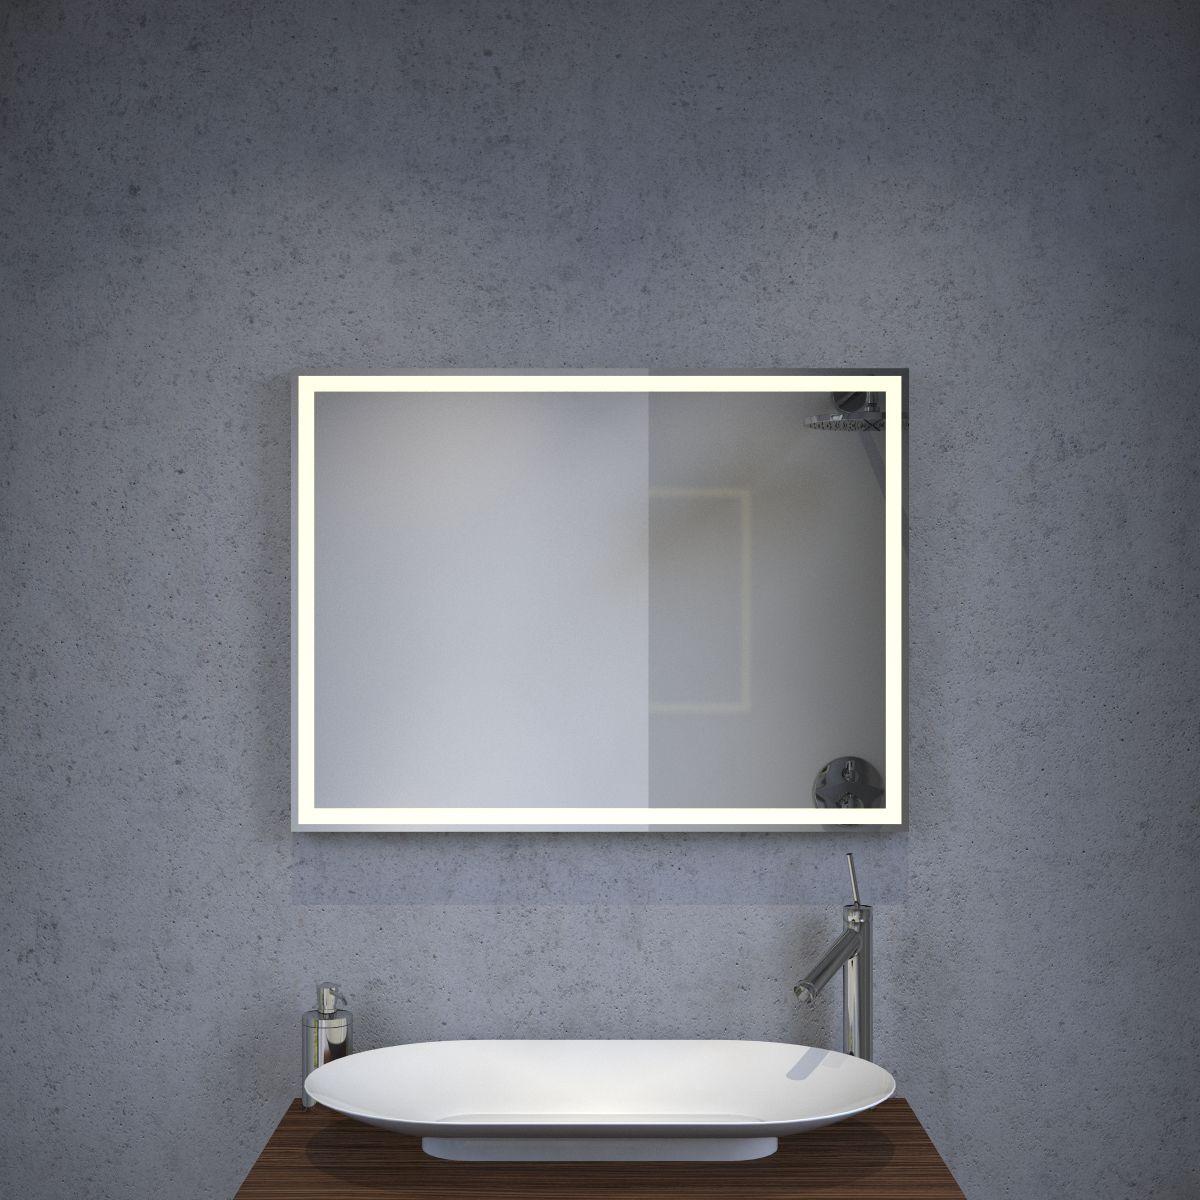 Interessant Design badkamer LED spiegel met verwarming en sensor 80x60 cm  TG42